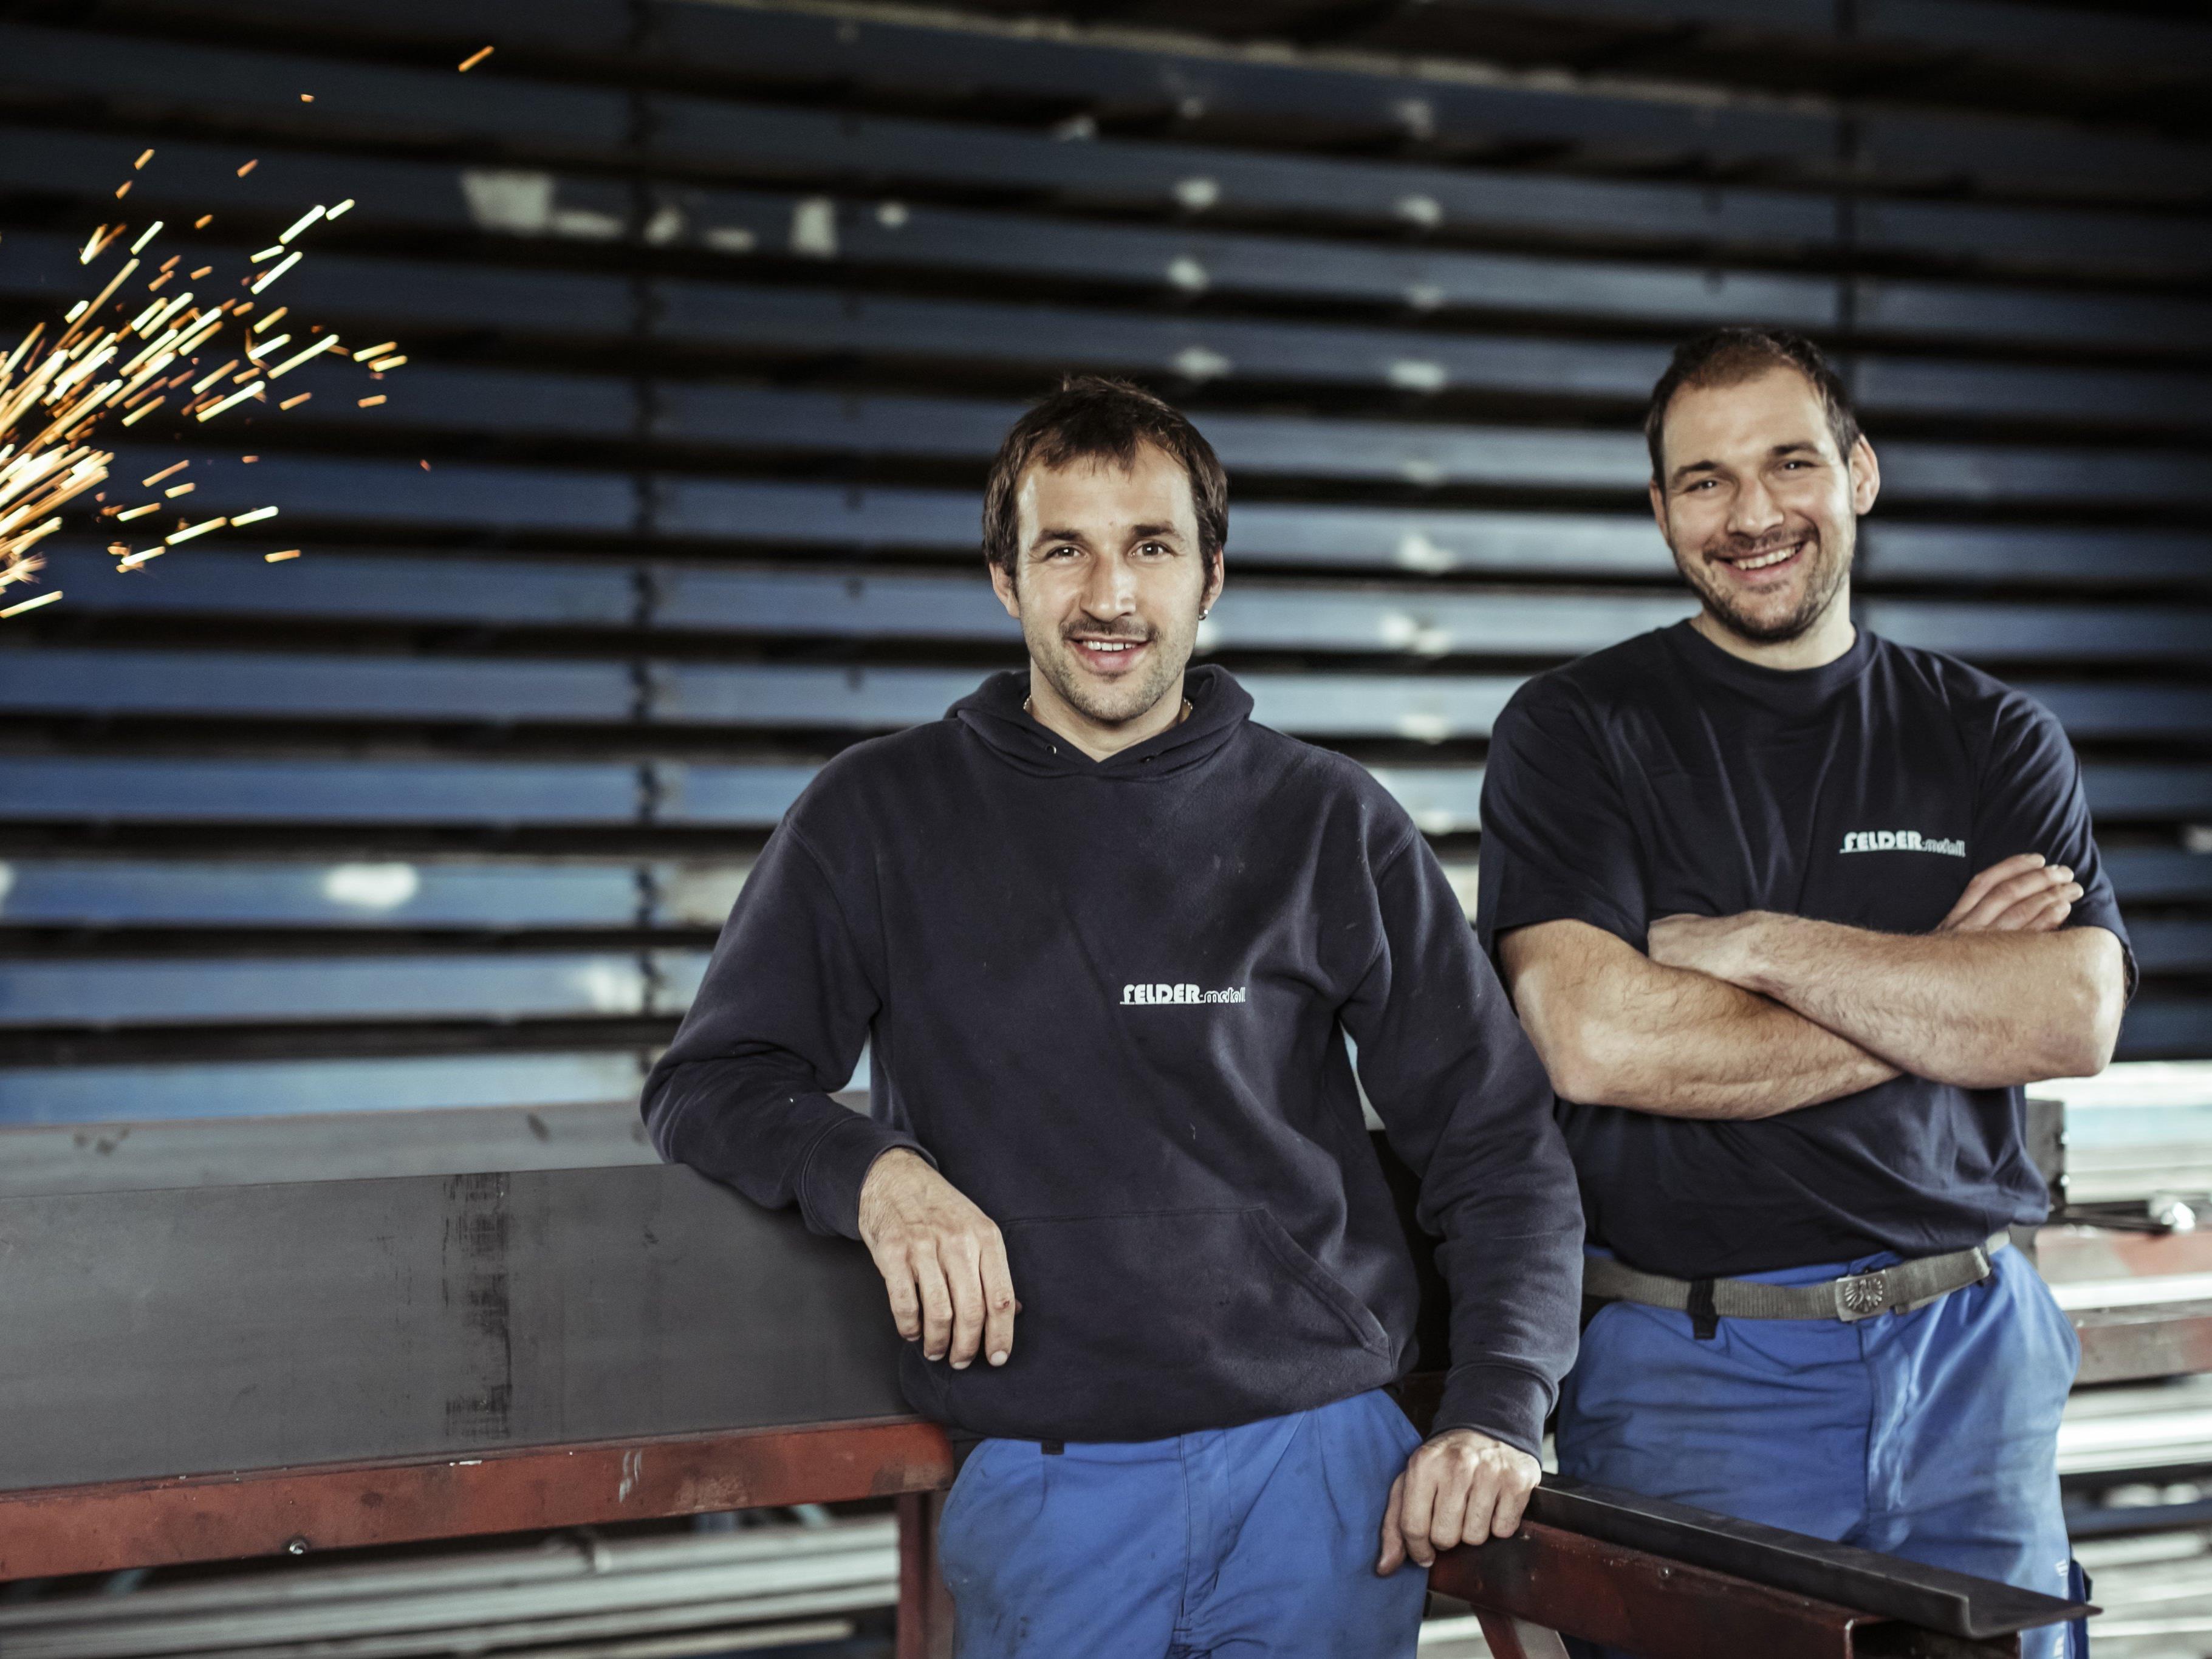 Die Brüder Jodok und Konrad Felder